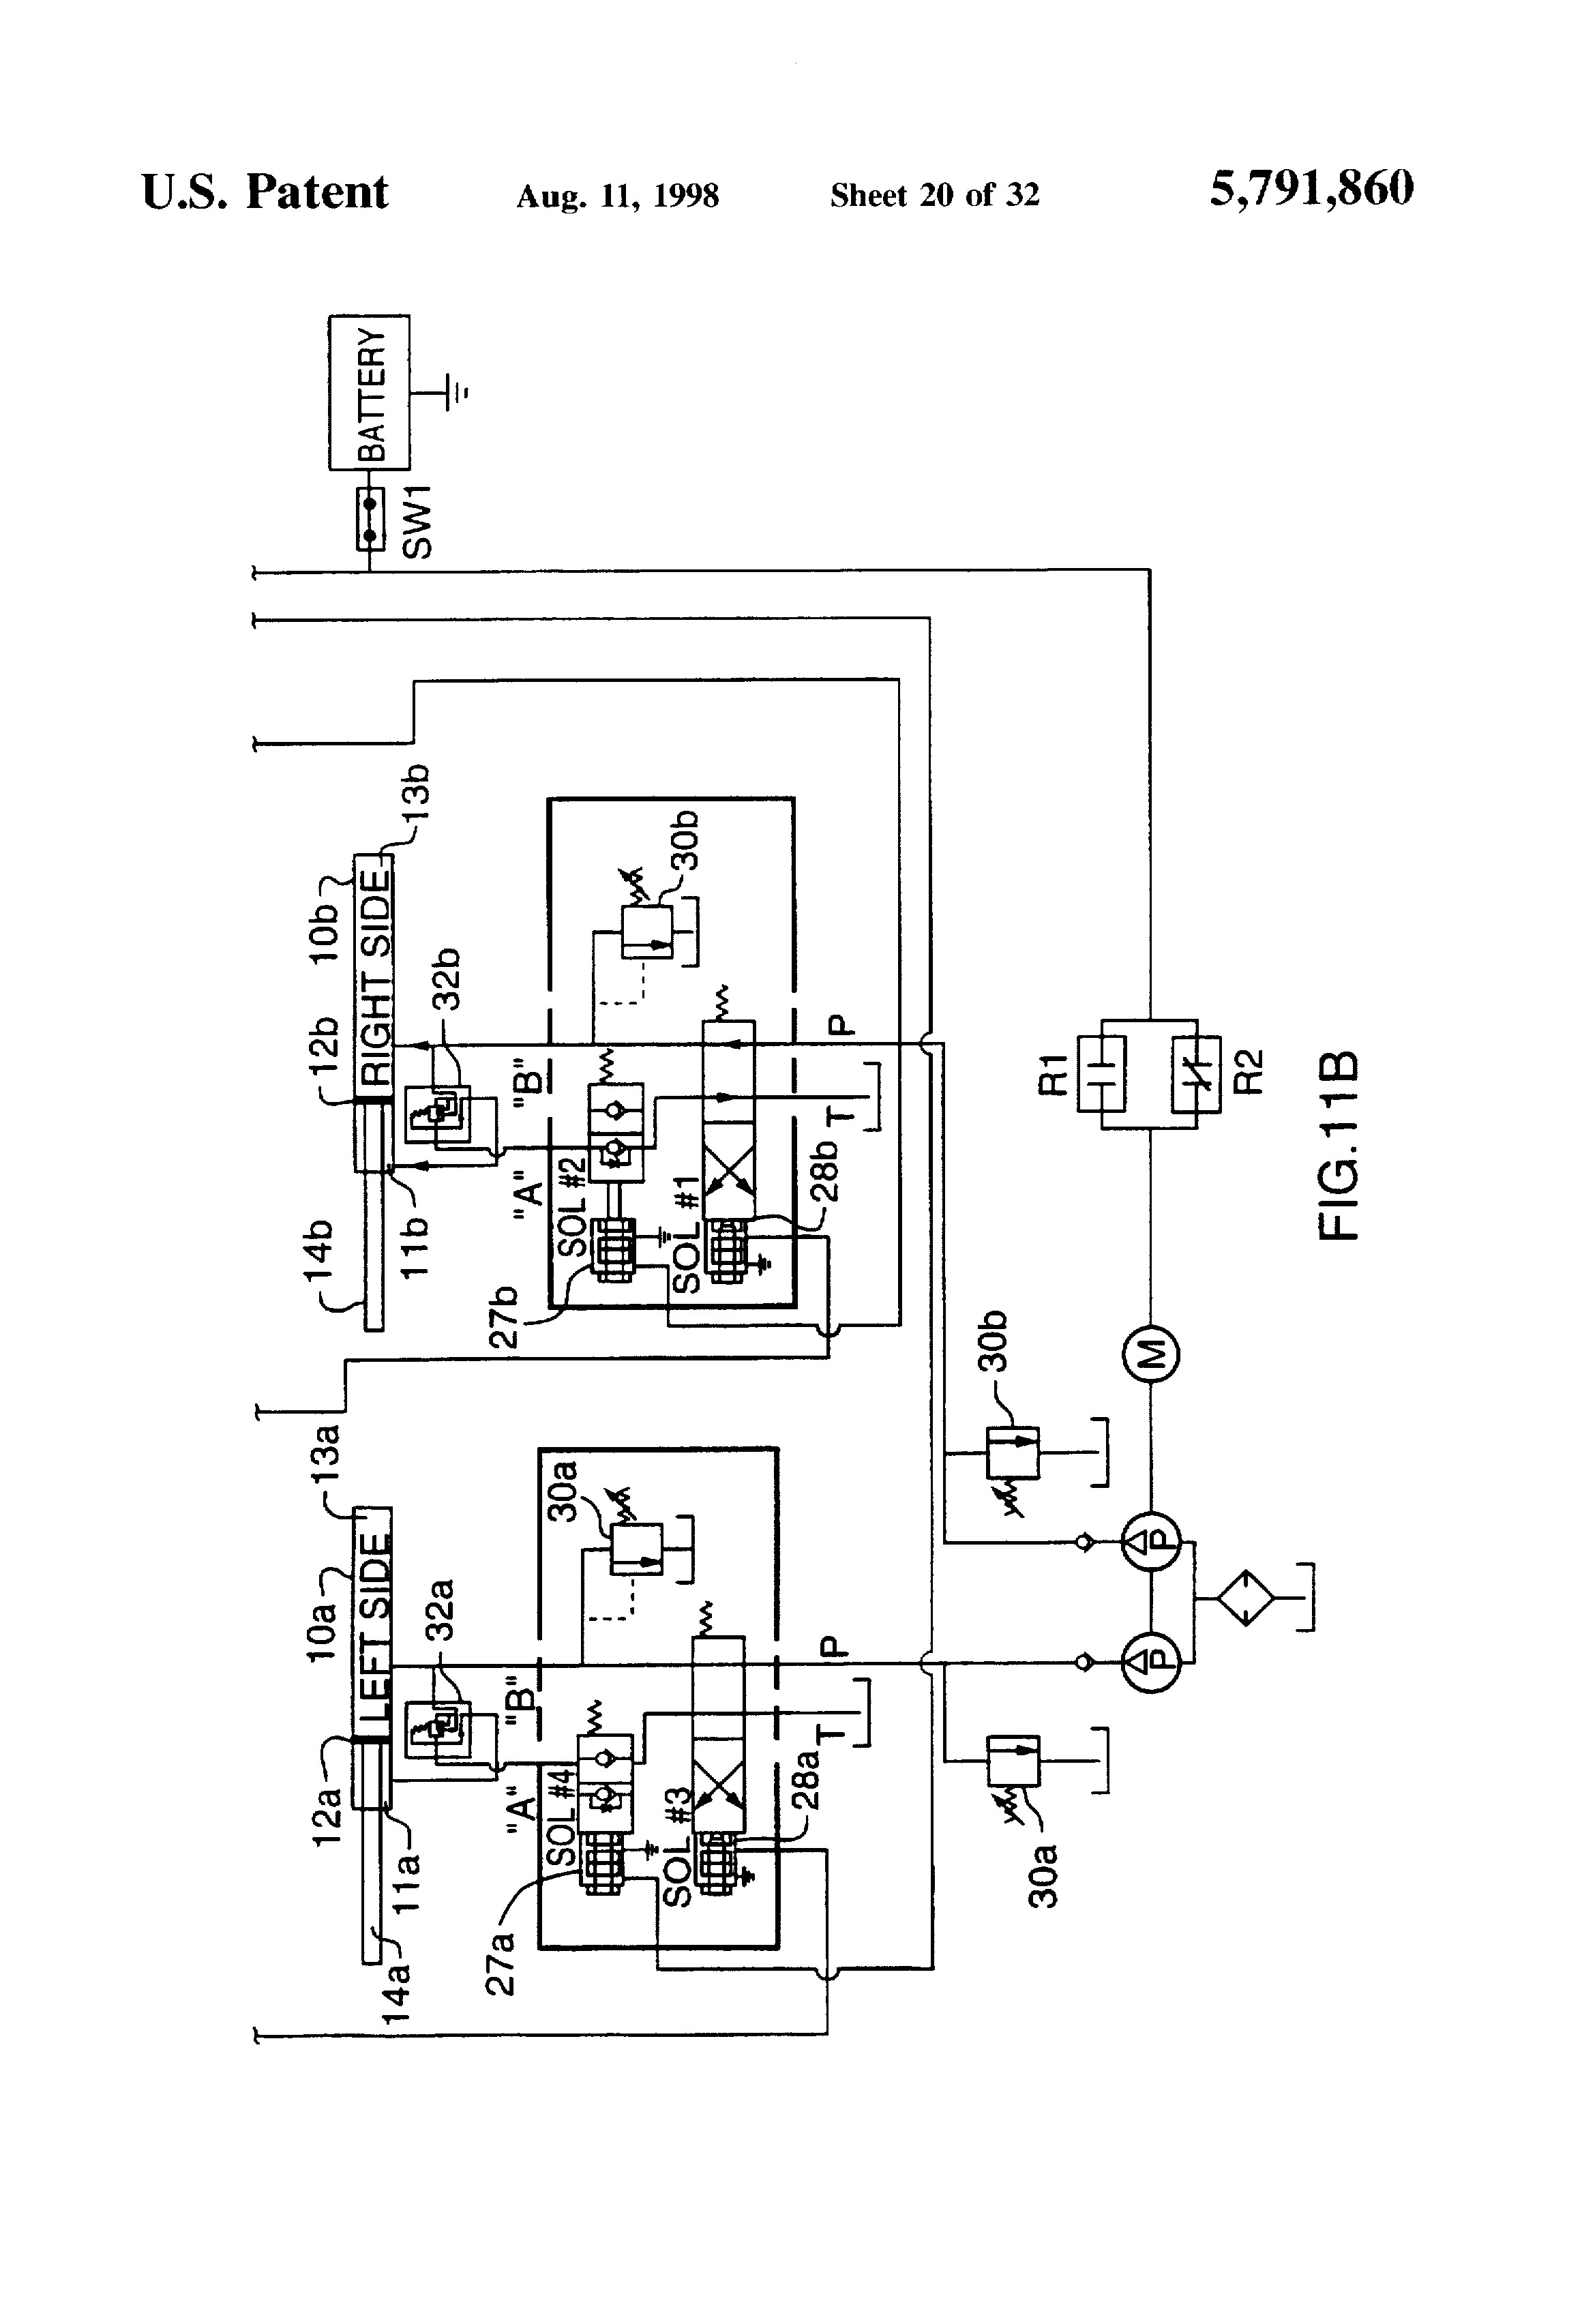 Bunker Hill Security 95914 Wiring 20 Fresh Waltco Liftgate Switch Wiring Diagram Of Bunker Hill Security 95914 Wiring